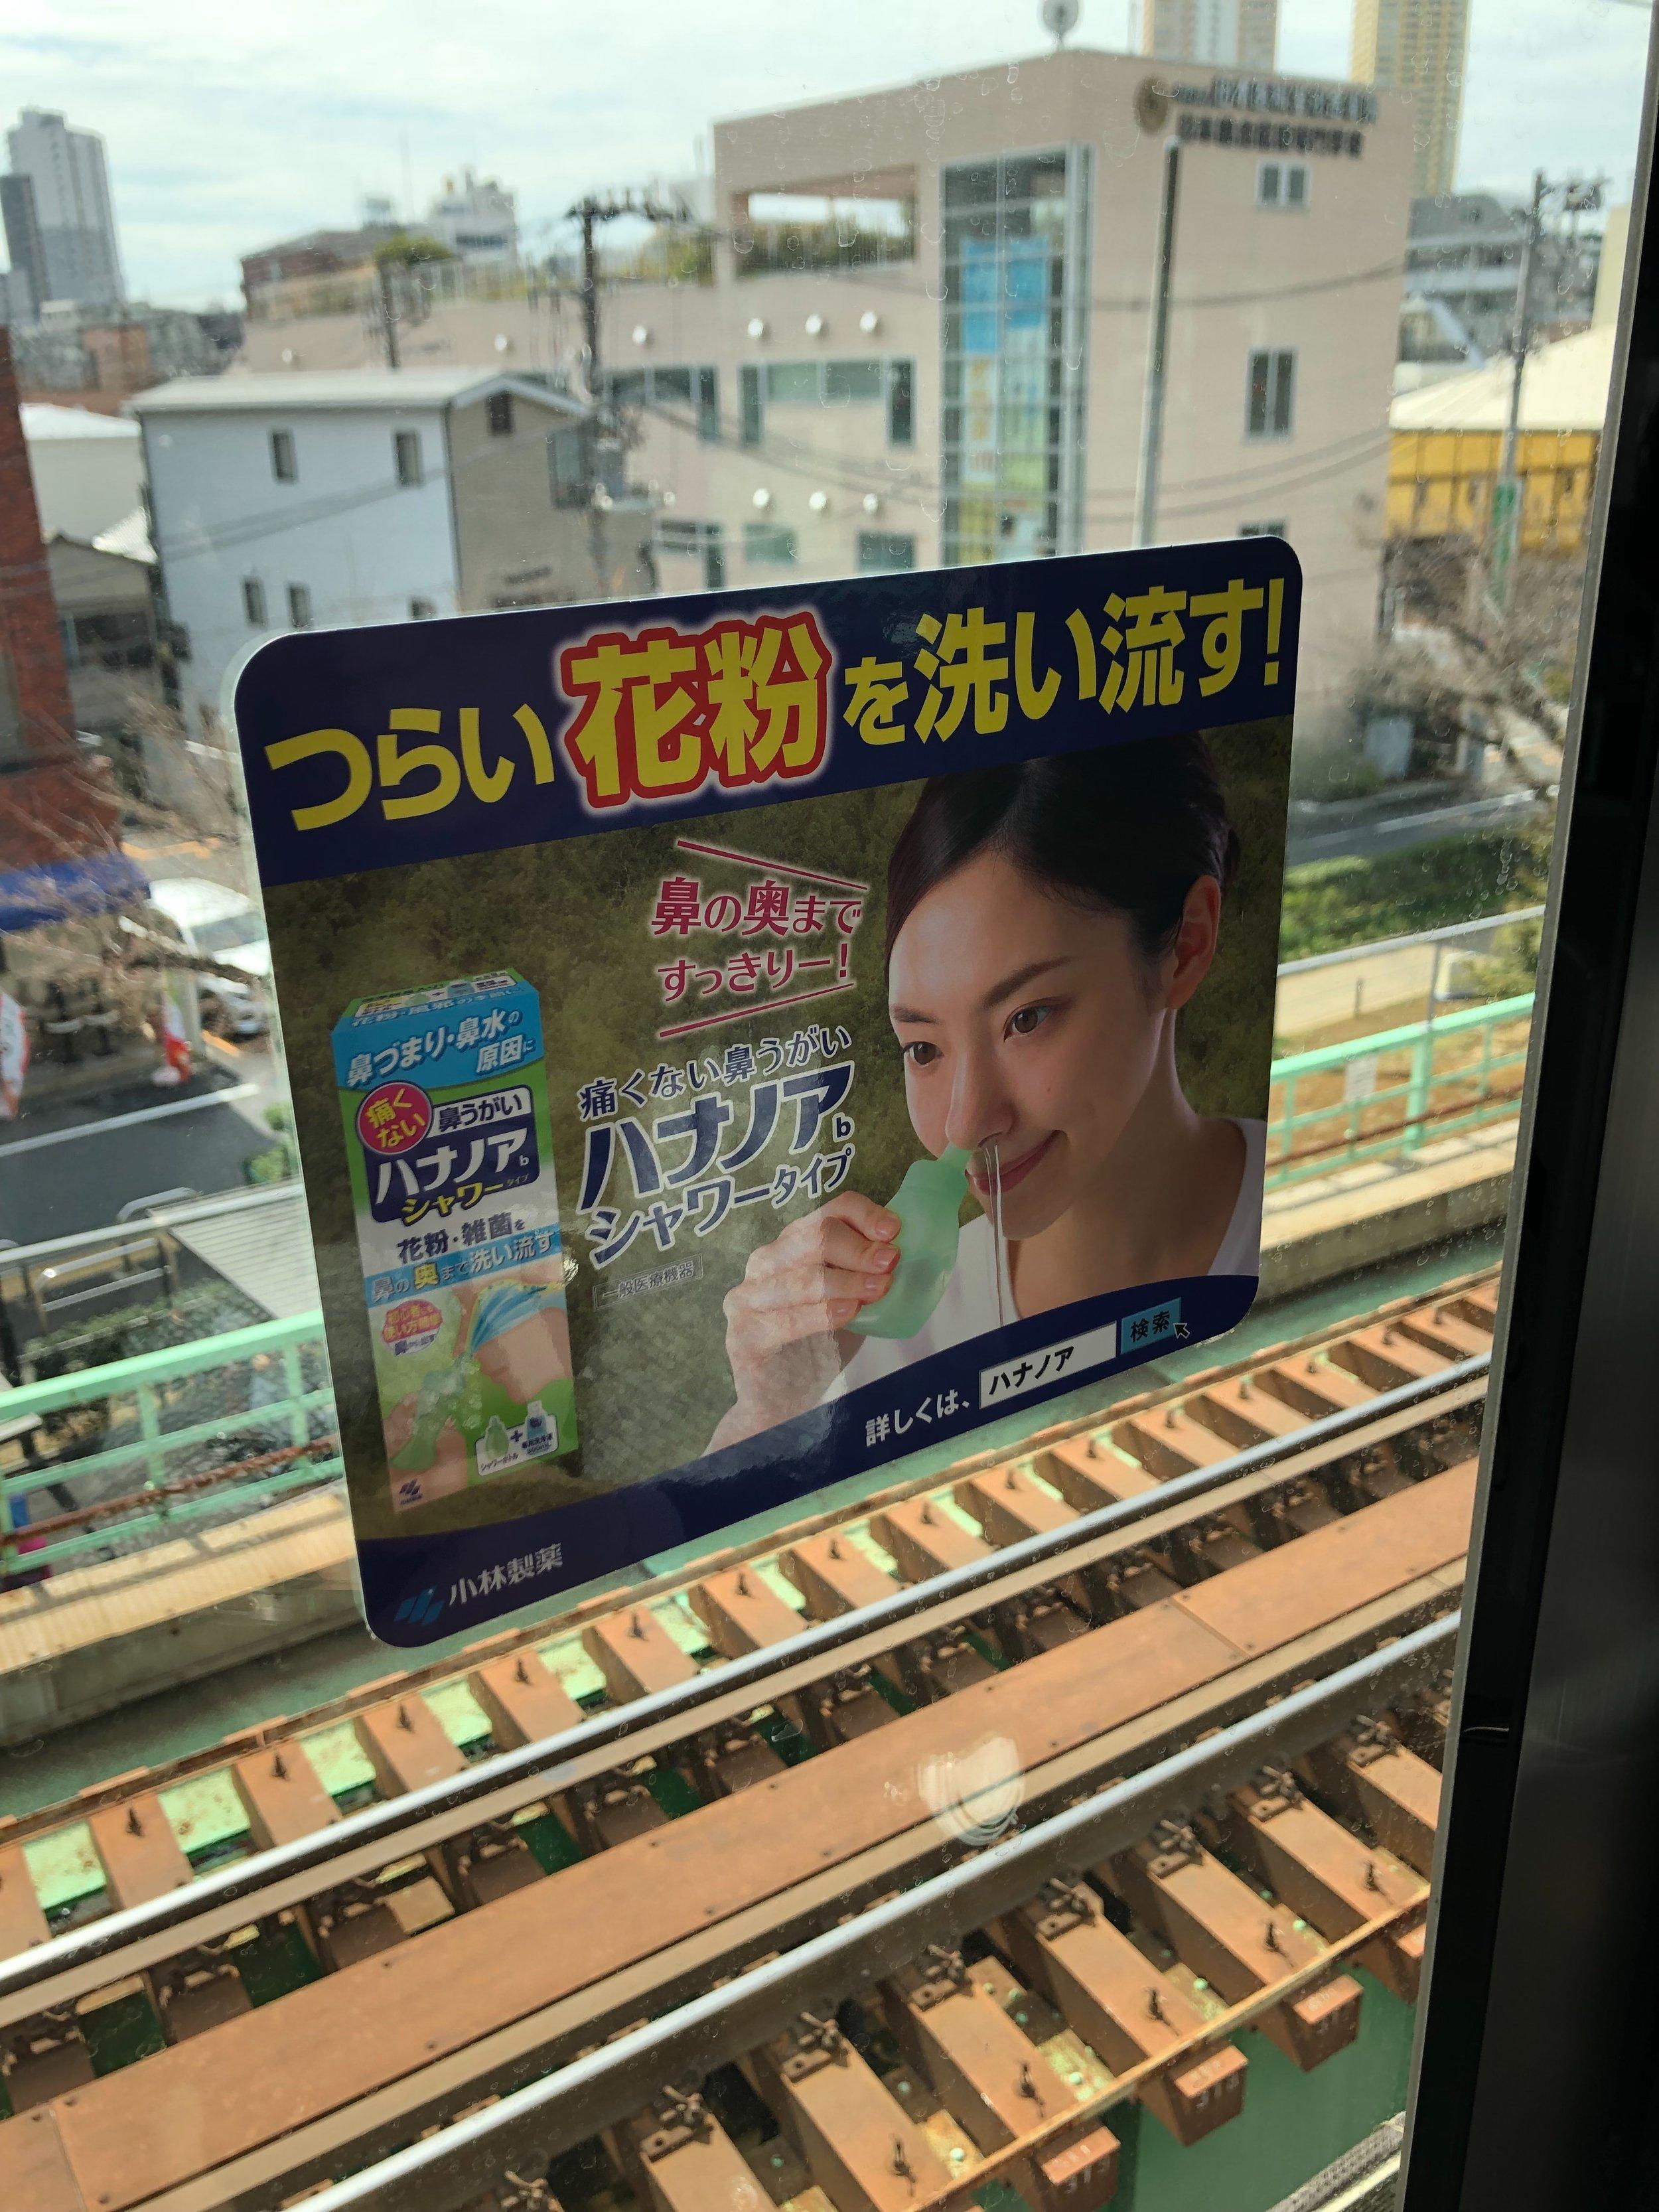 Advertisements, Tokyo.